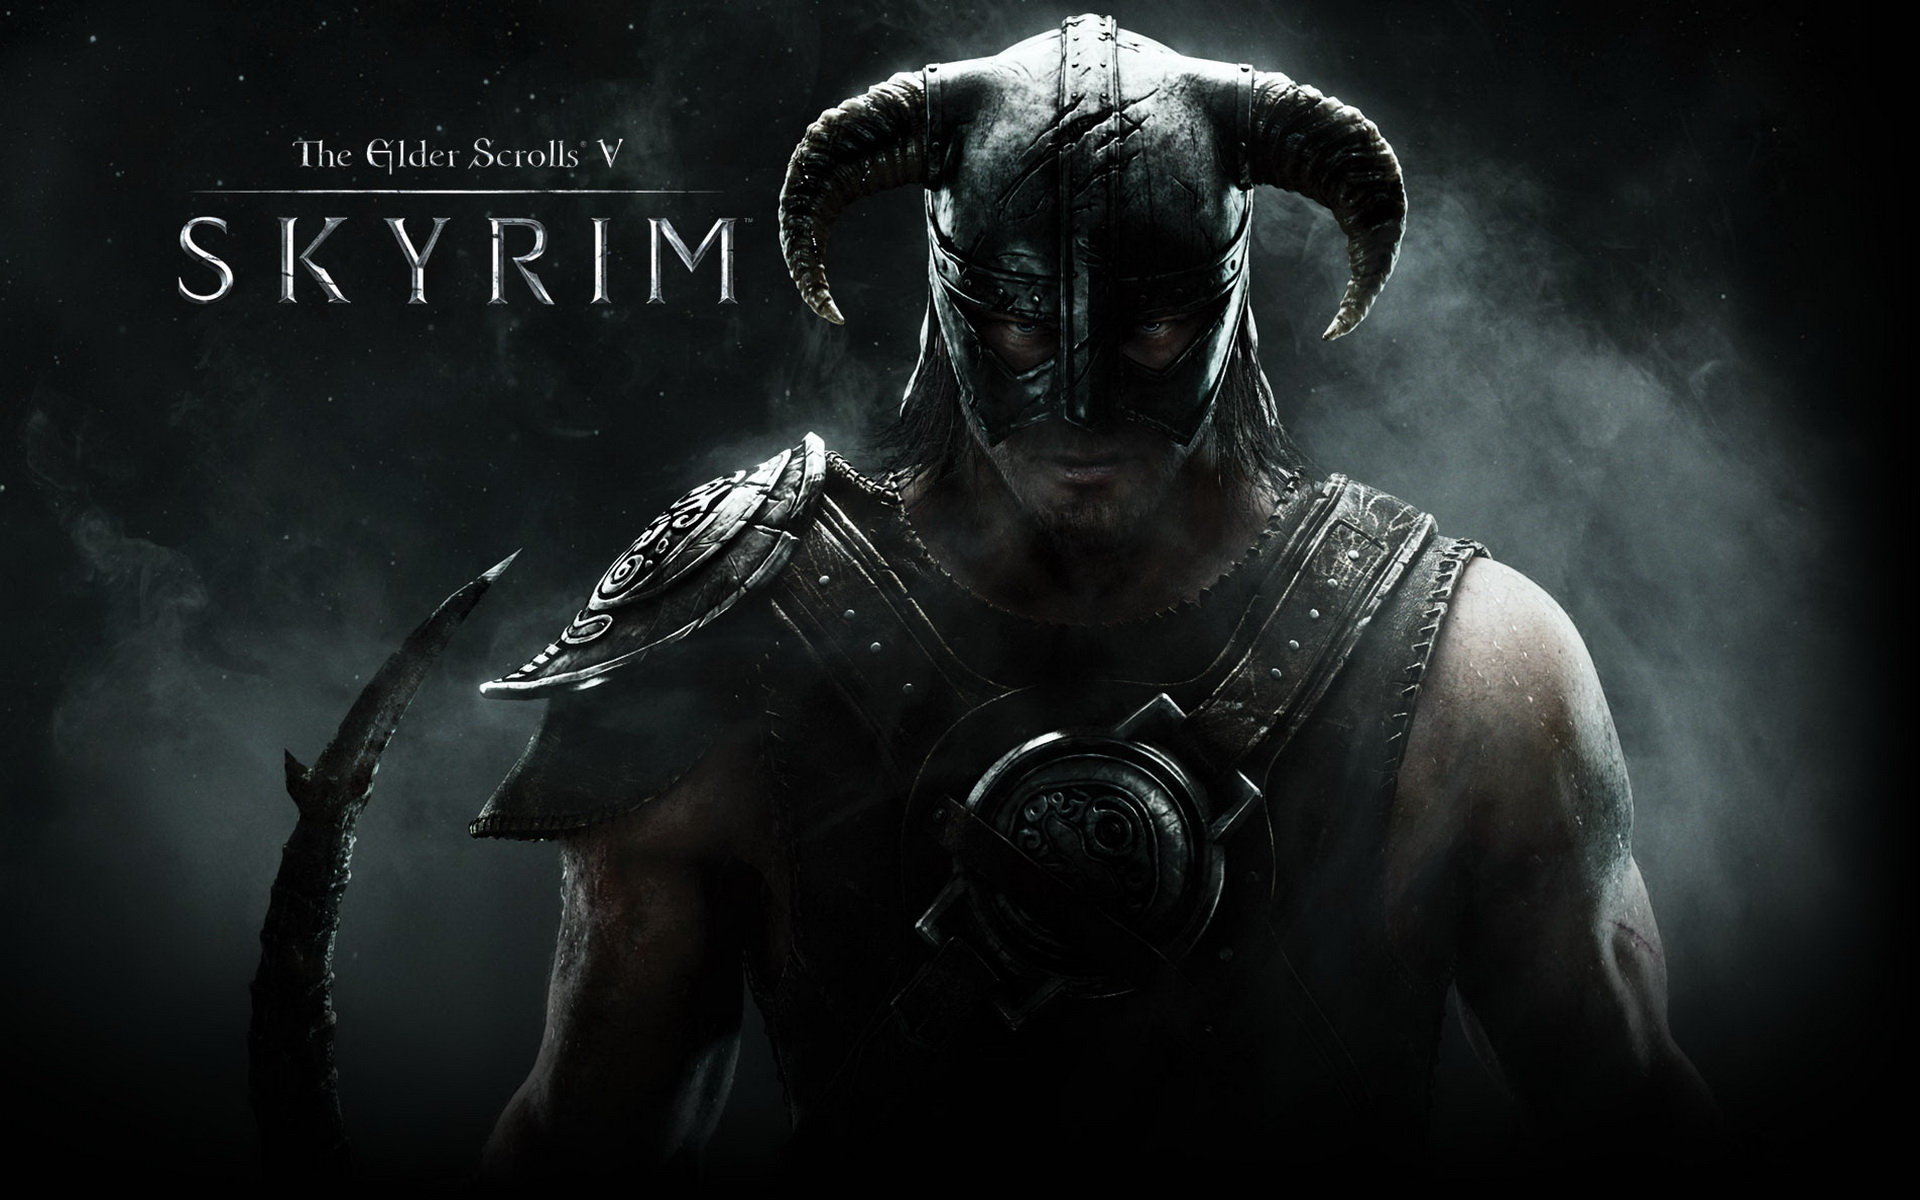 the_elder_scrolls_v_skyrim